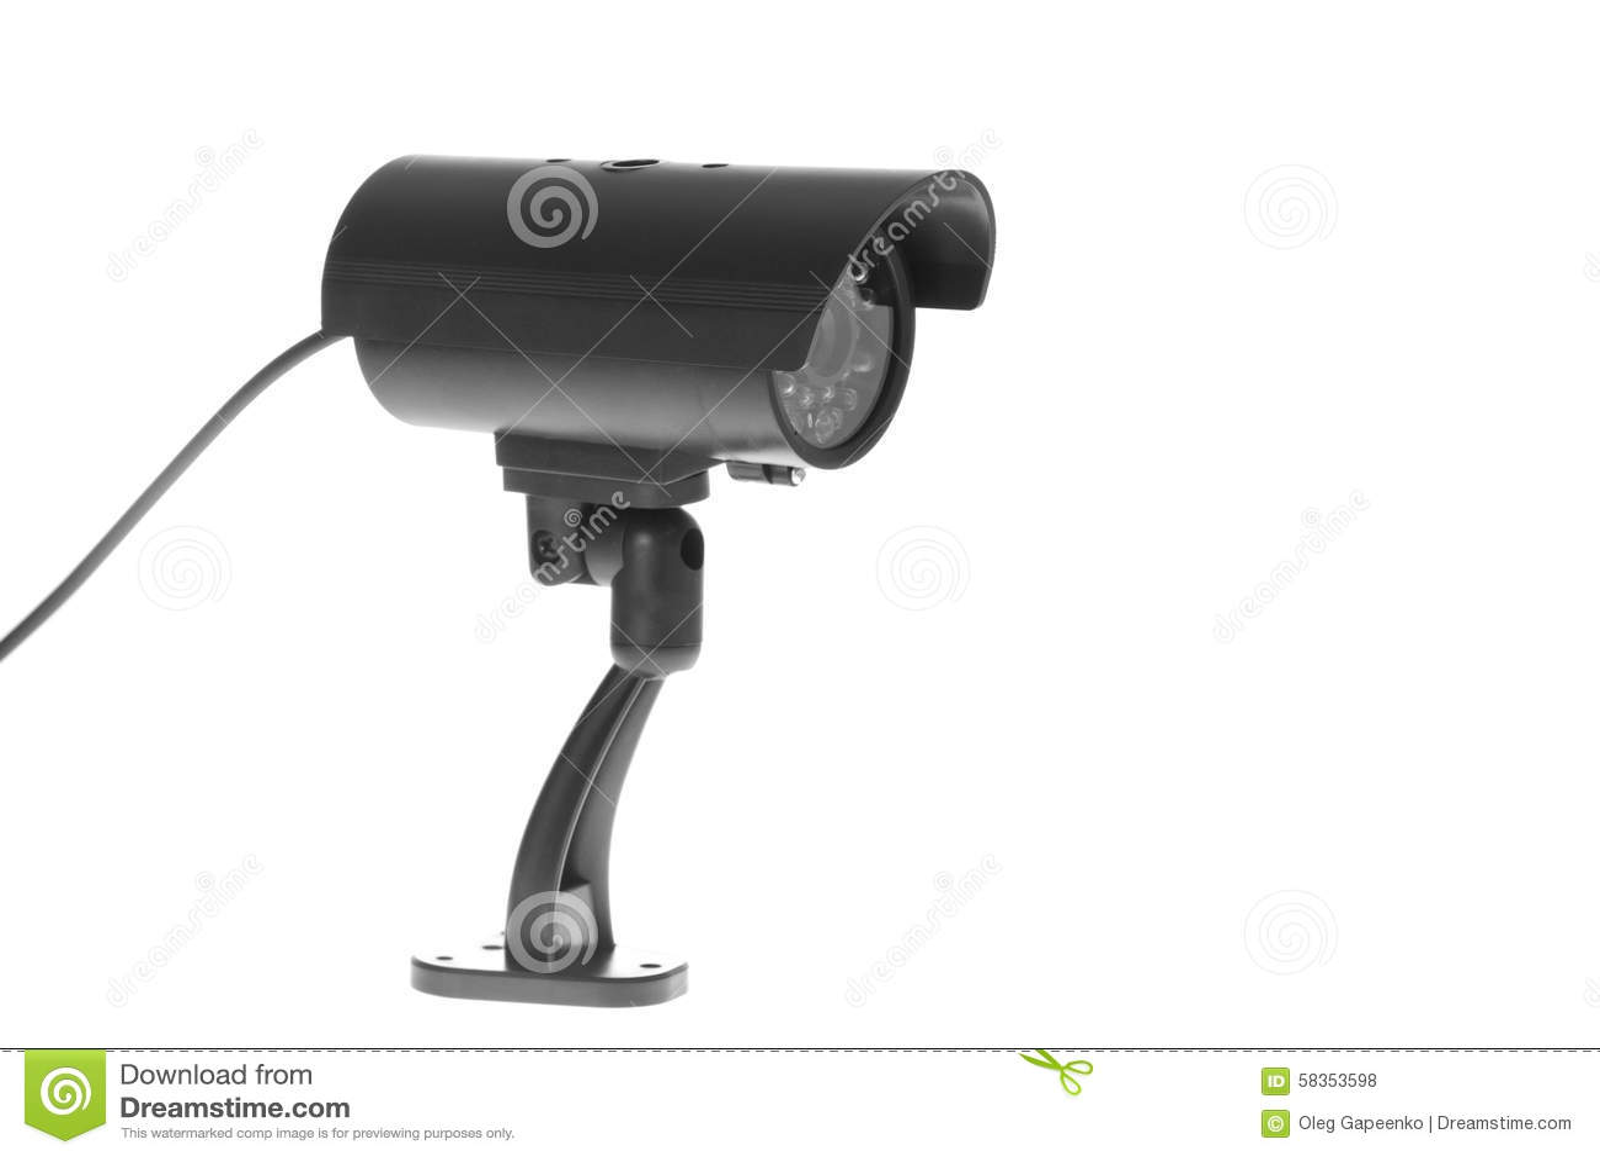 skritaya-kamera-ofis-video-porno-video-prikolnih-telochek